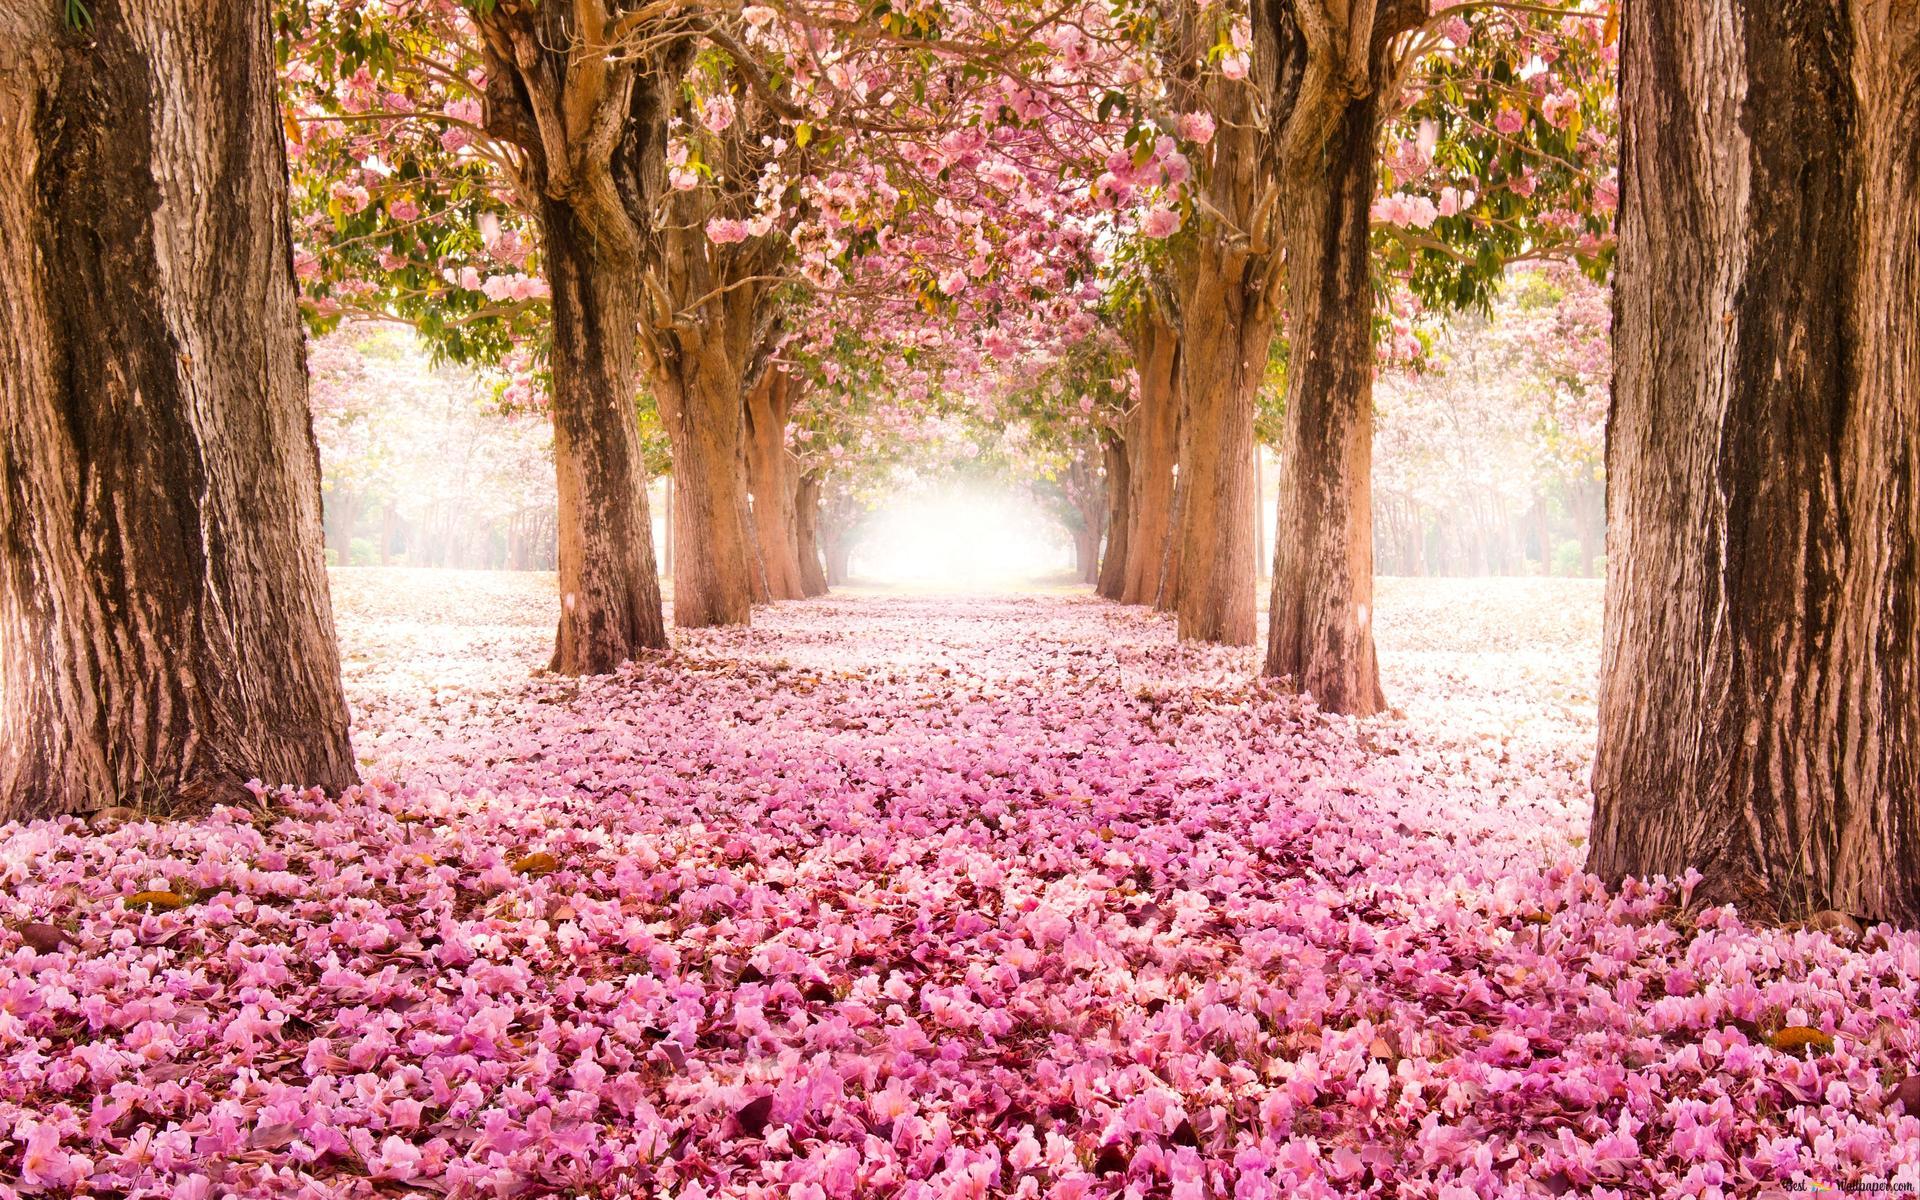 Nature Tree Flower Way Hd Wallpaper Download